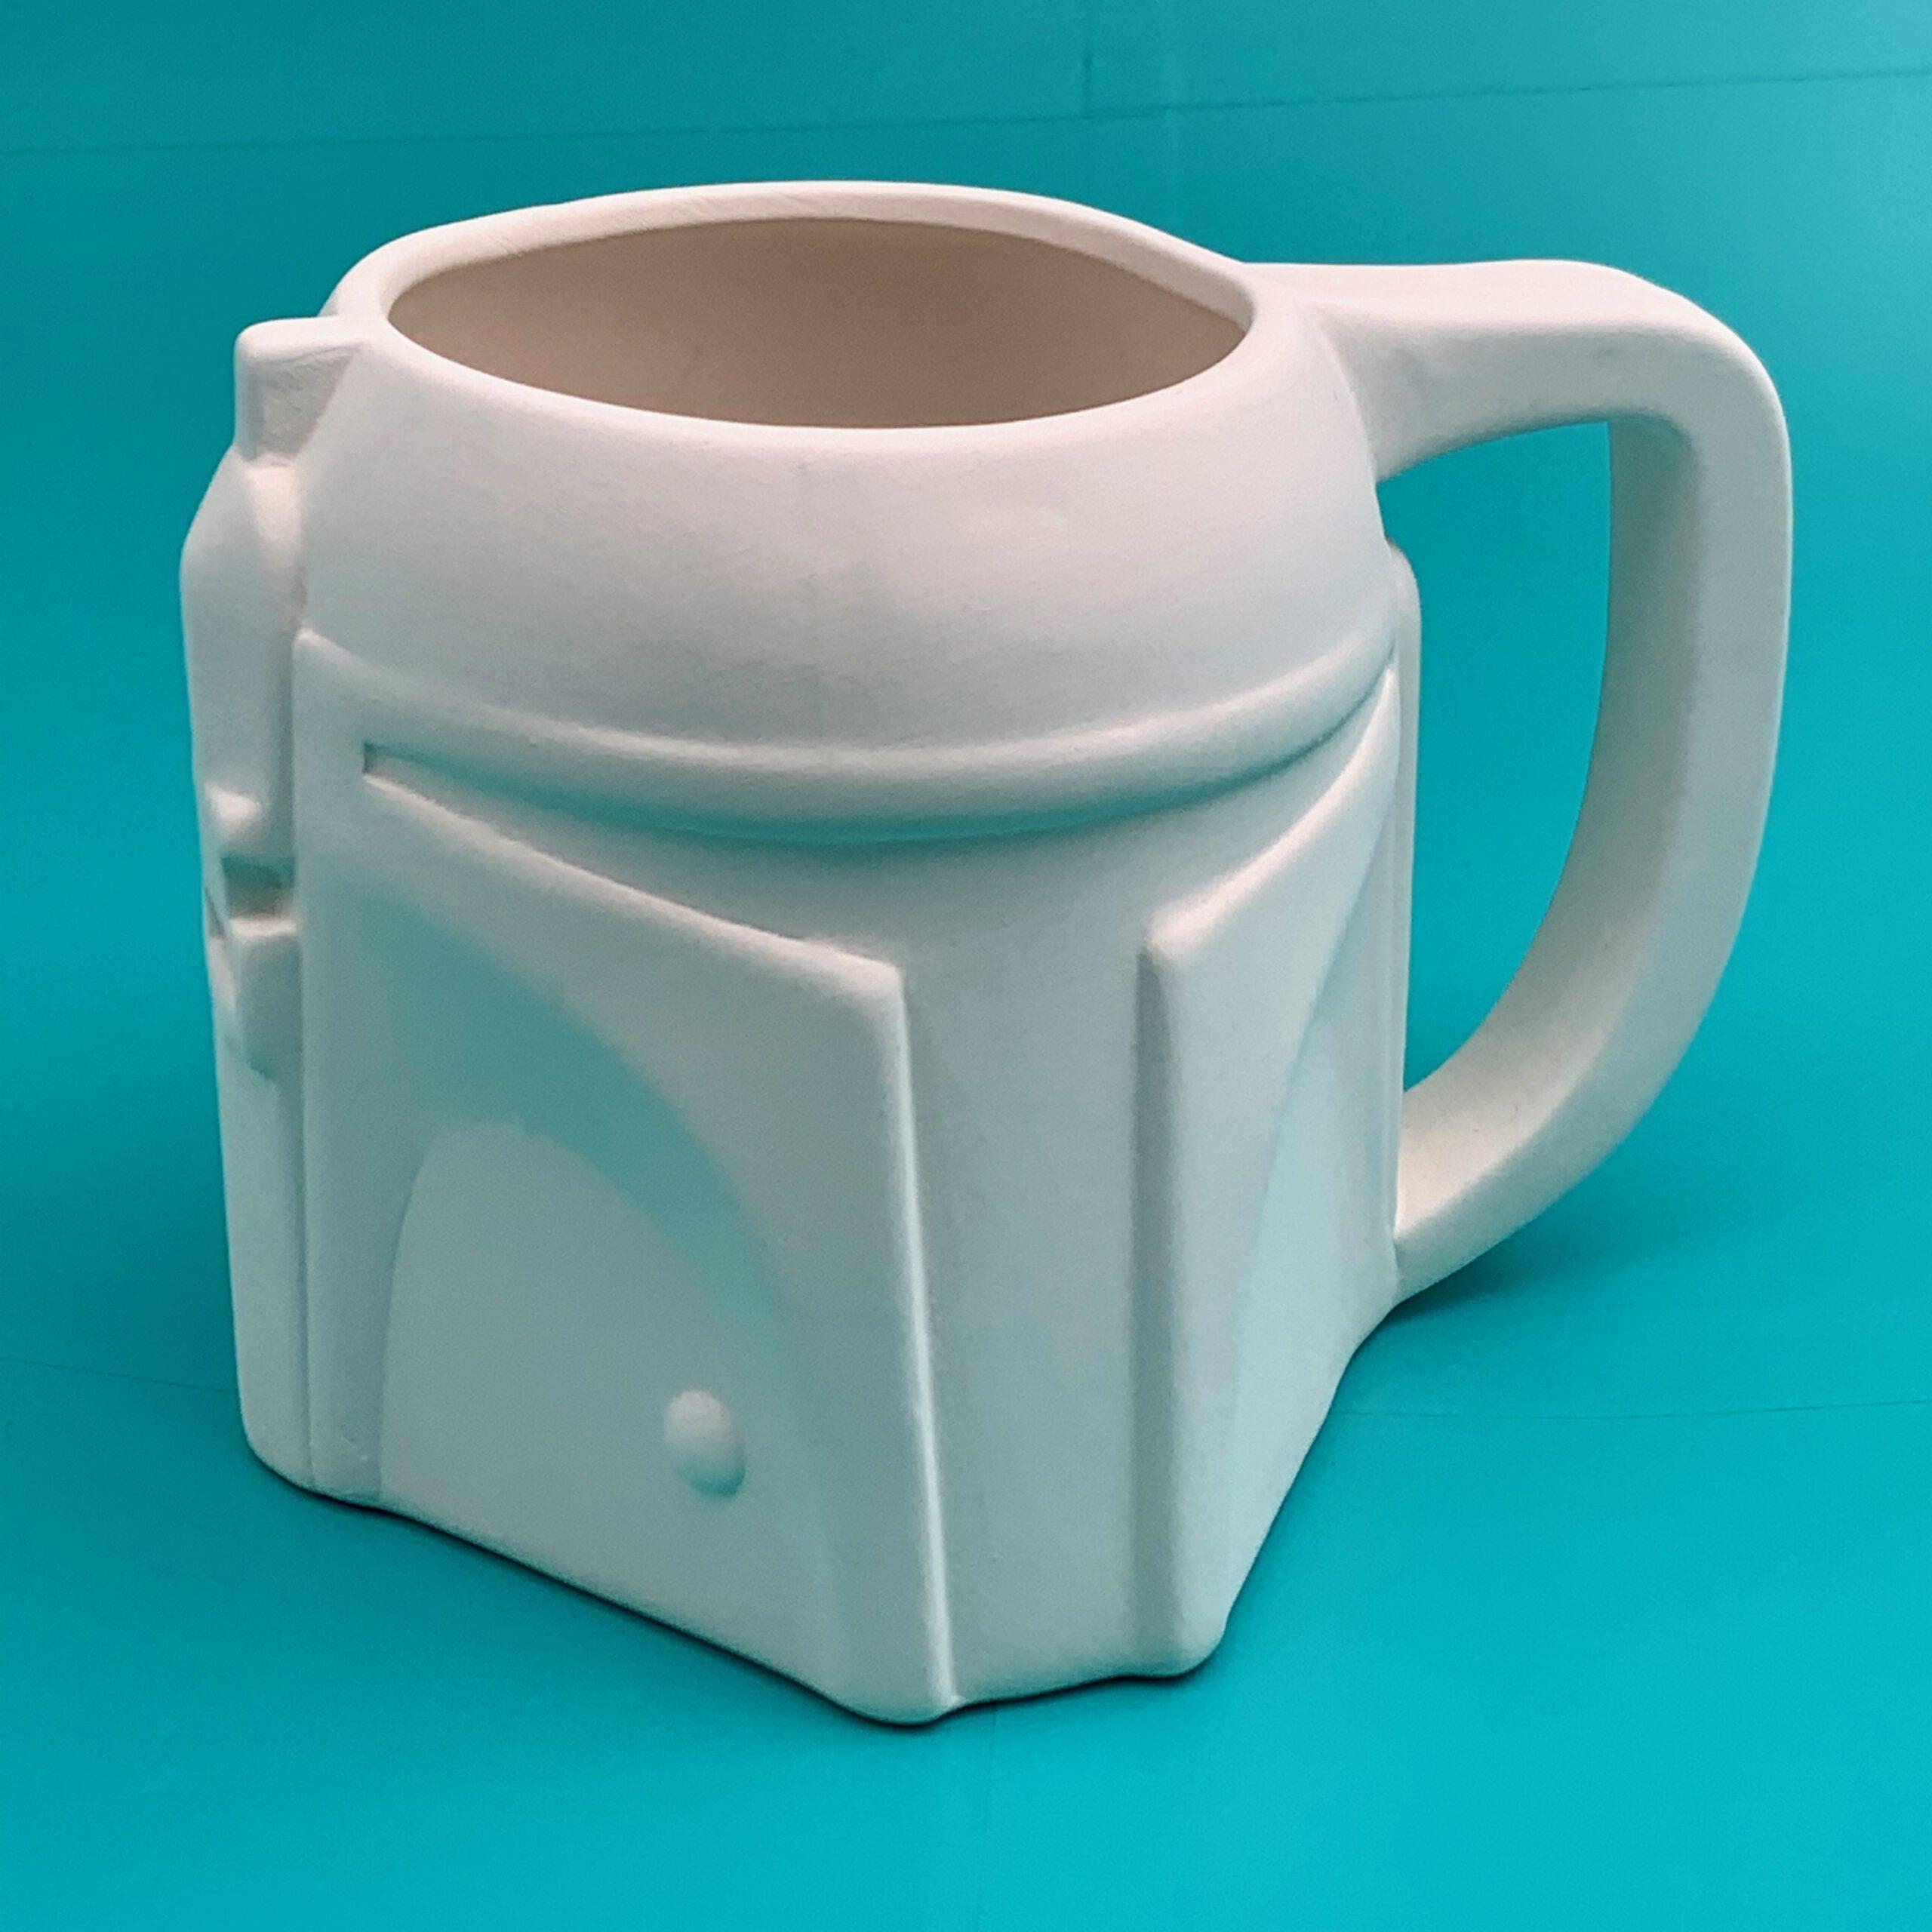 Create Art Studio Ceramics boba fett mug